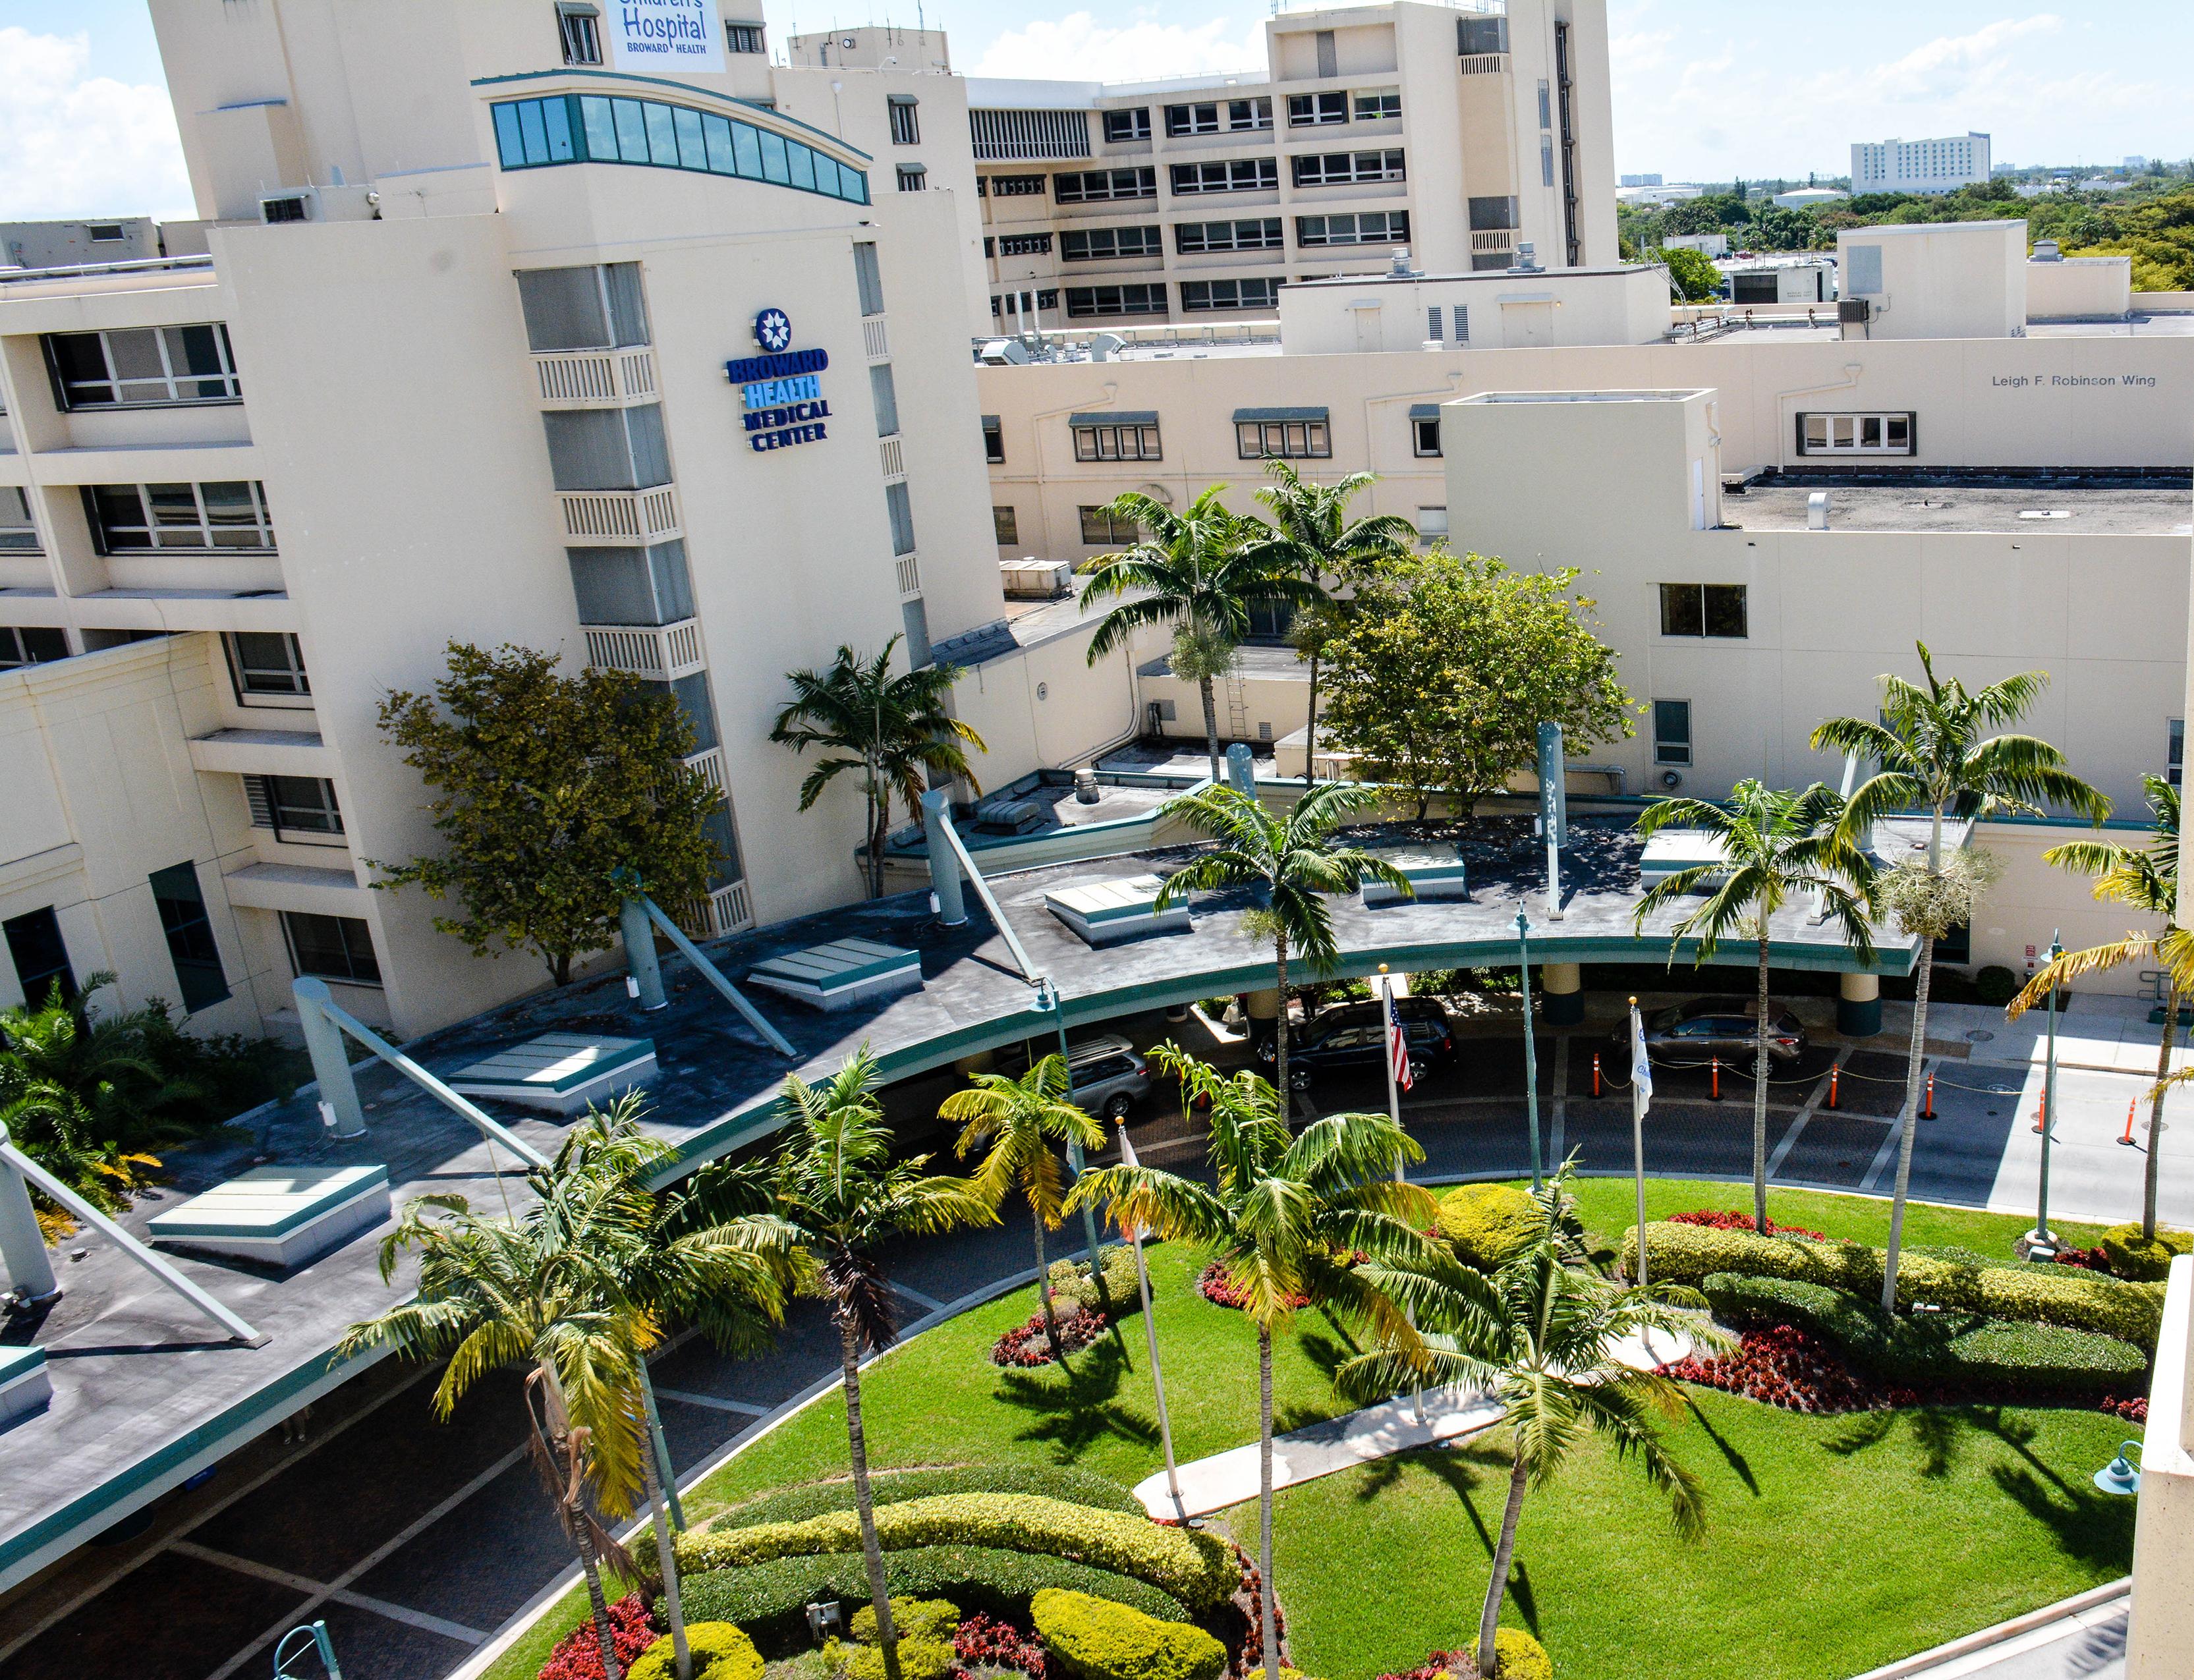 Broward Health Medical Center